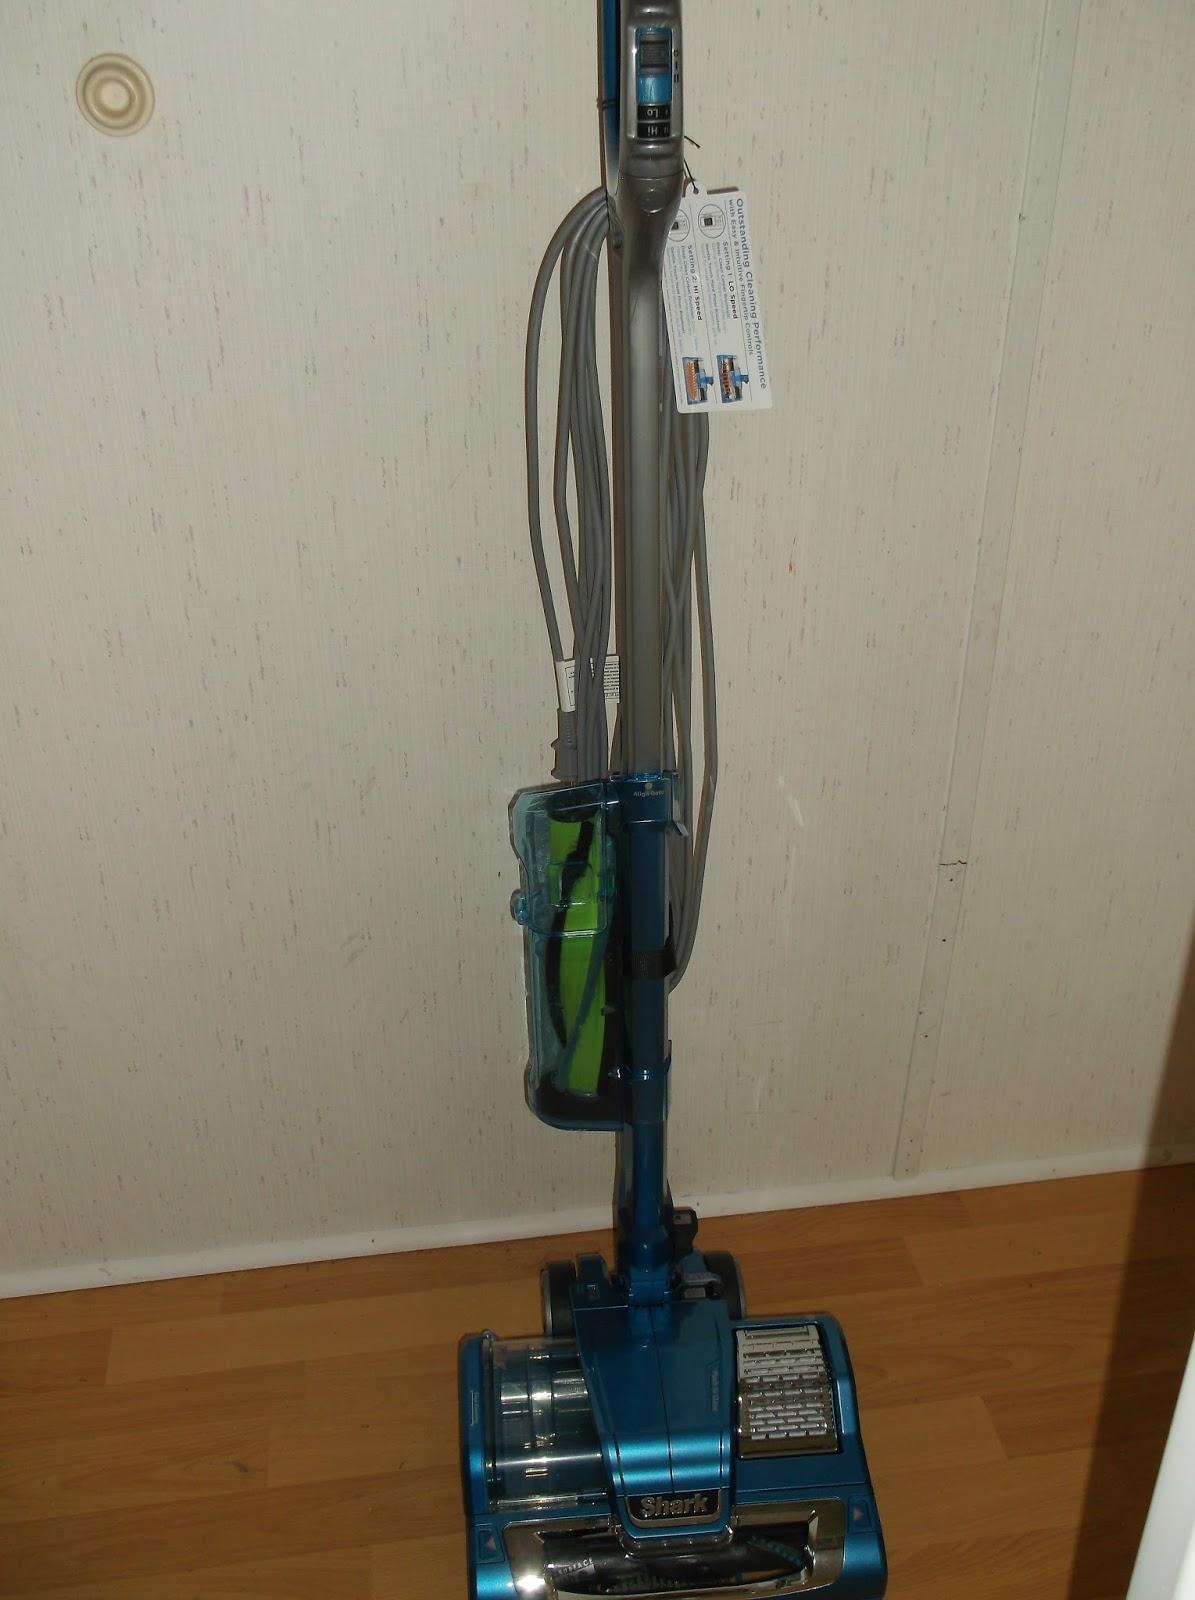 Vacuum Wand For Hardwood Floors And Carpet